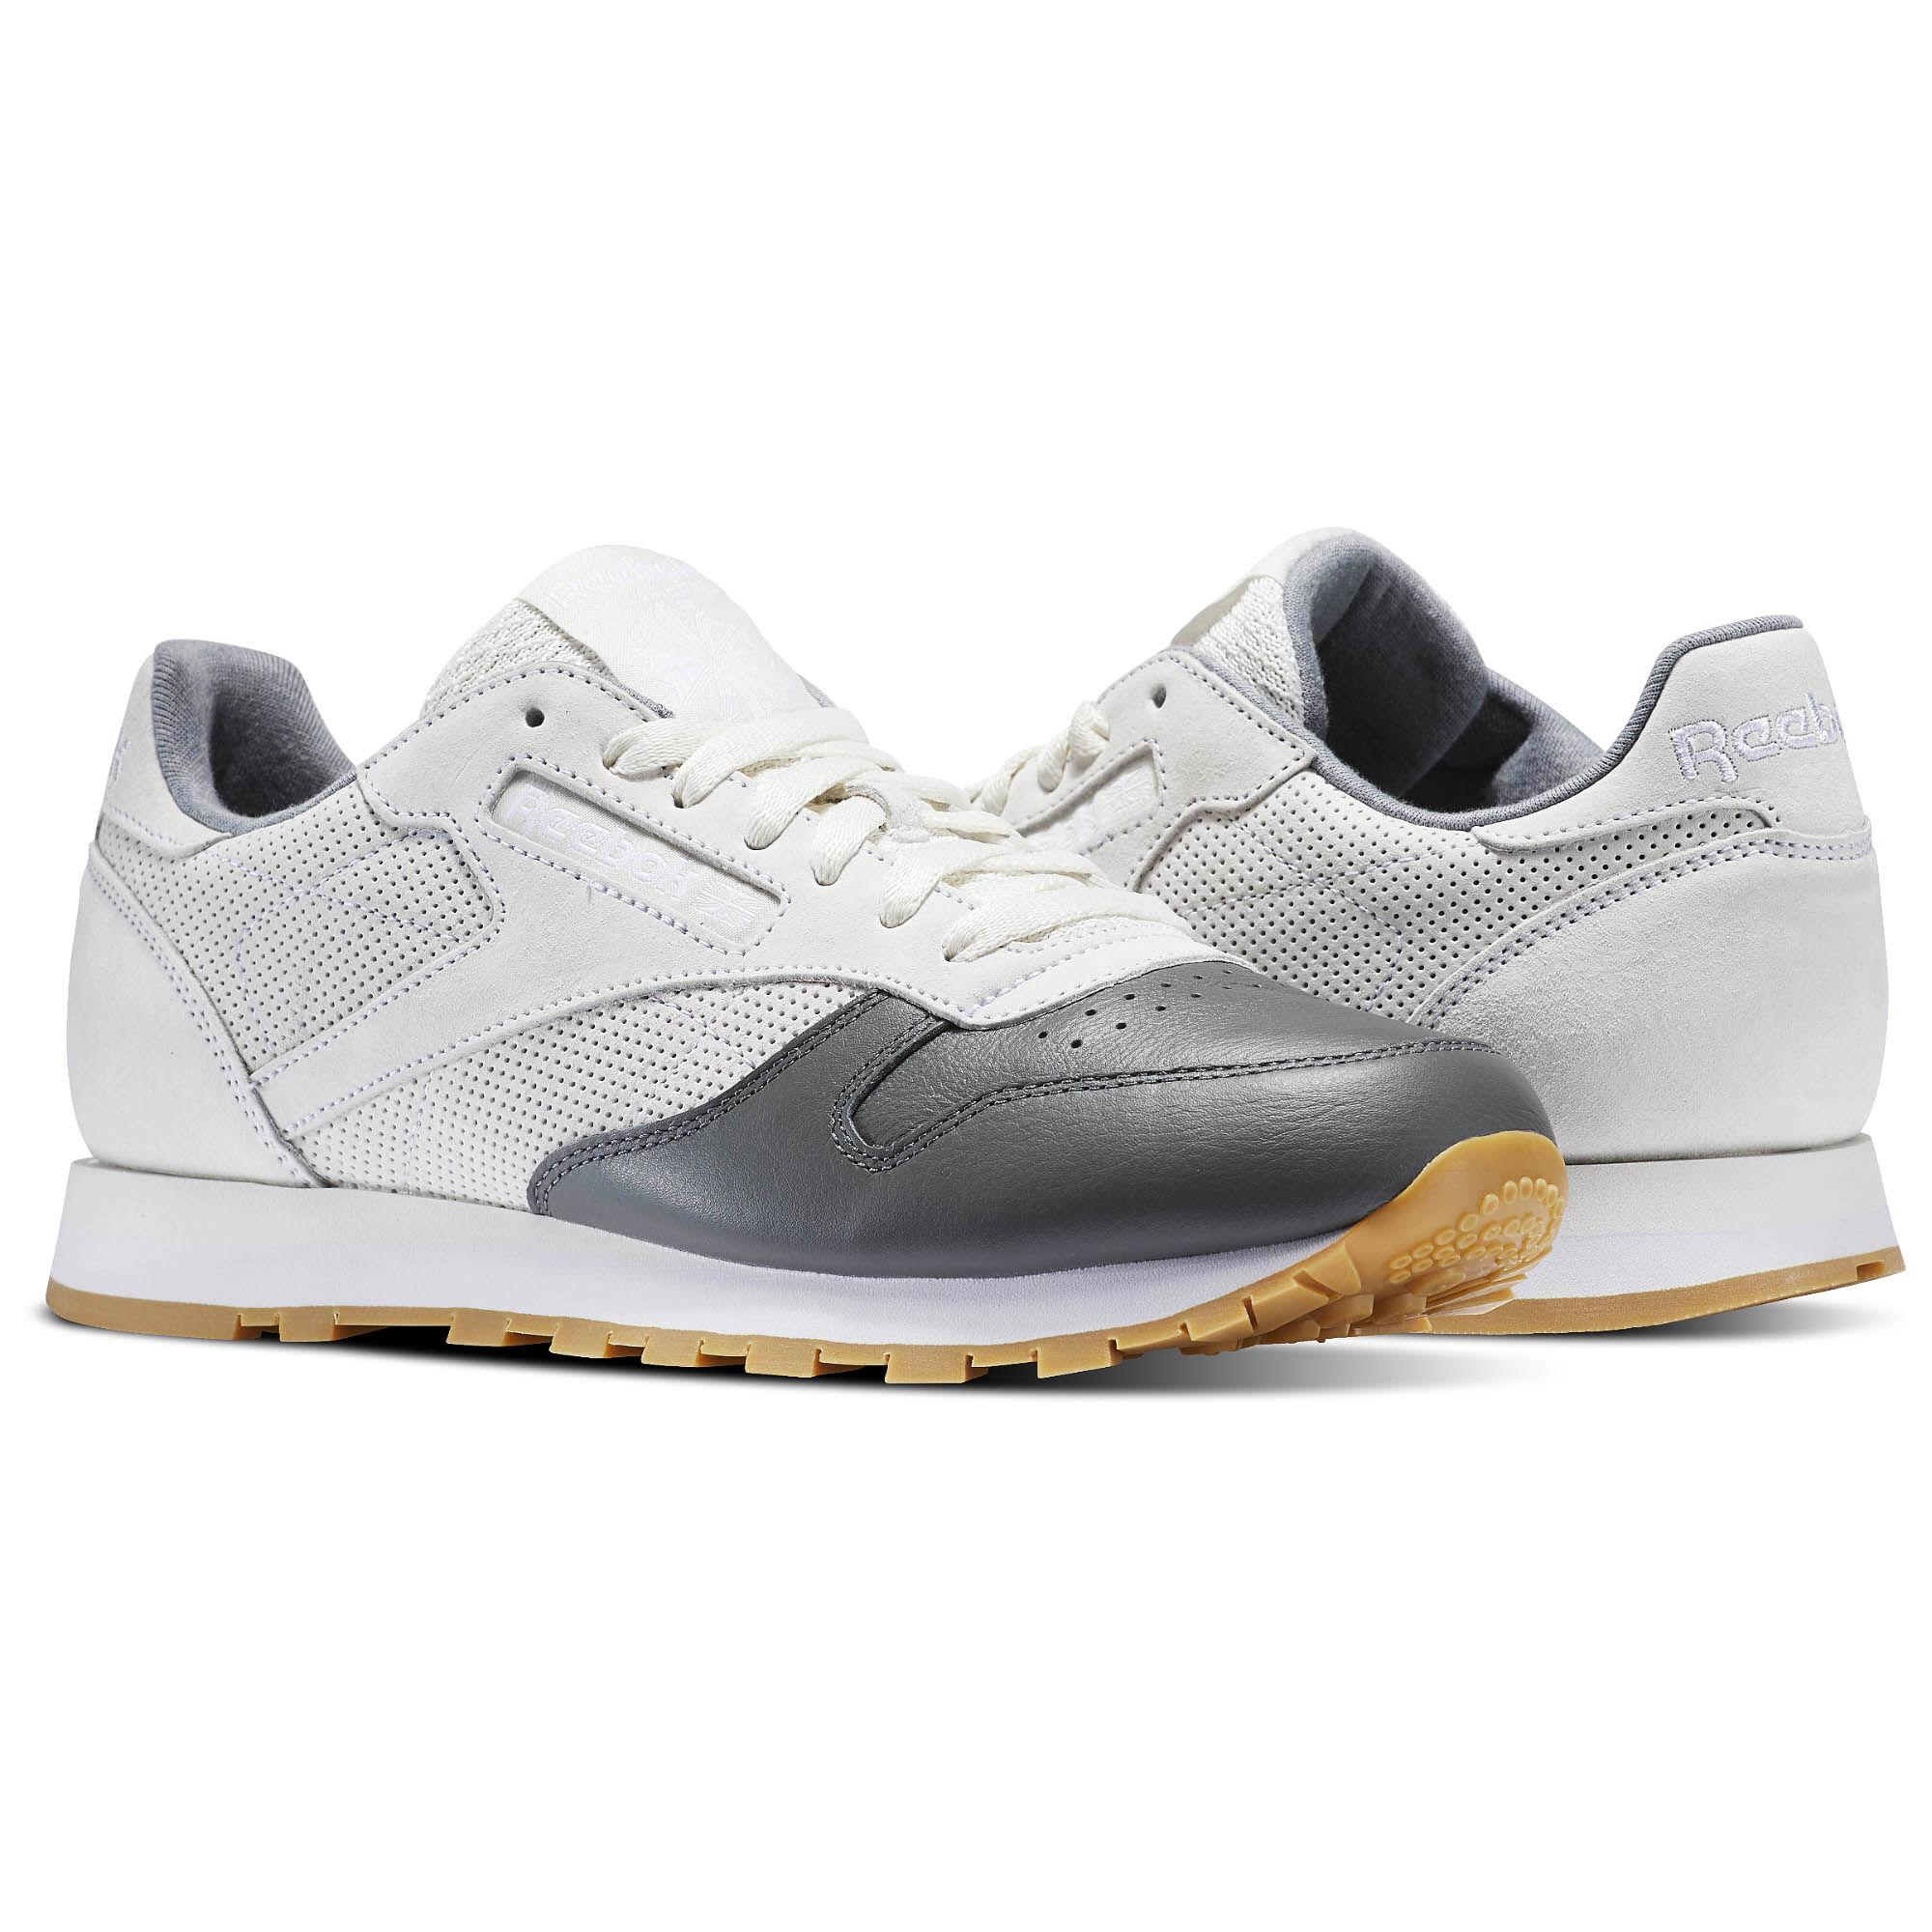 reebok tennis shoes for men cheap   OFF56% The Largest Catalog Discounts 941608d09